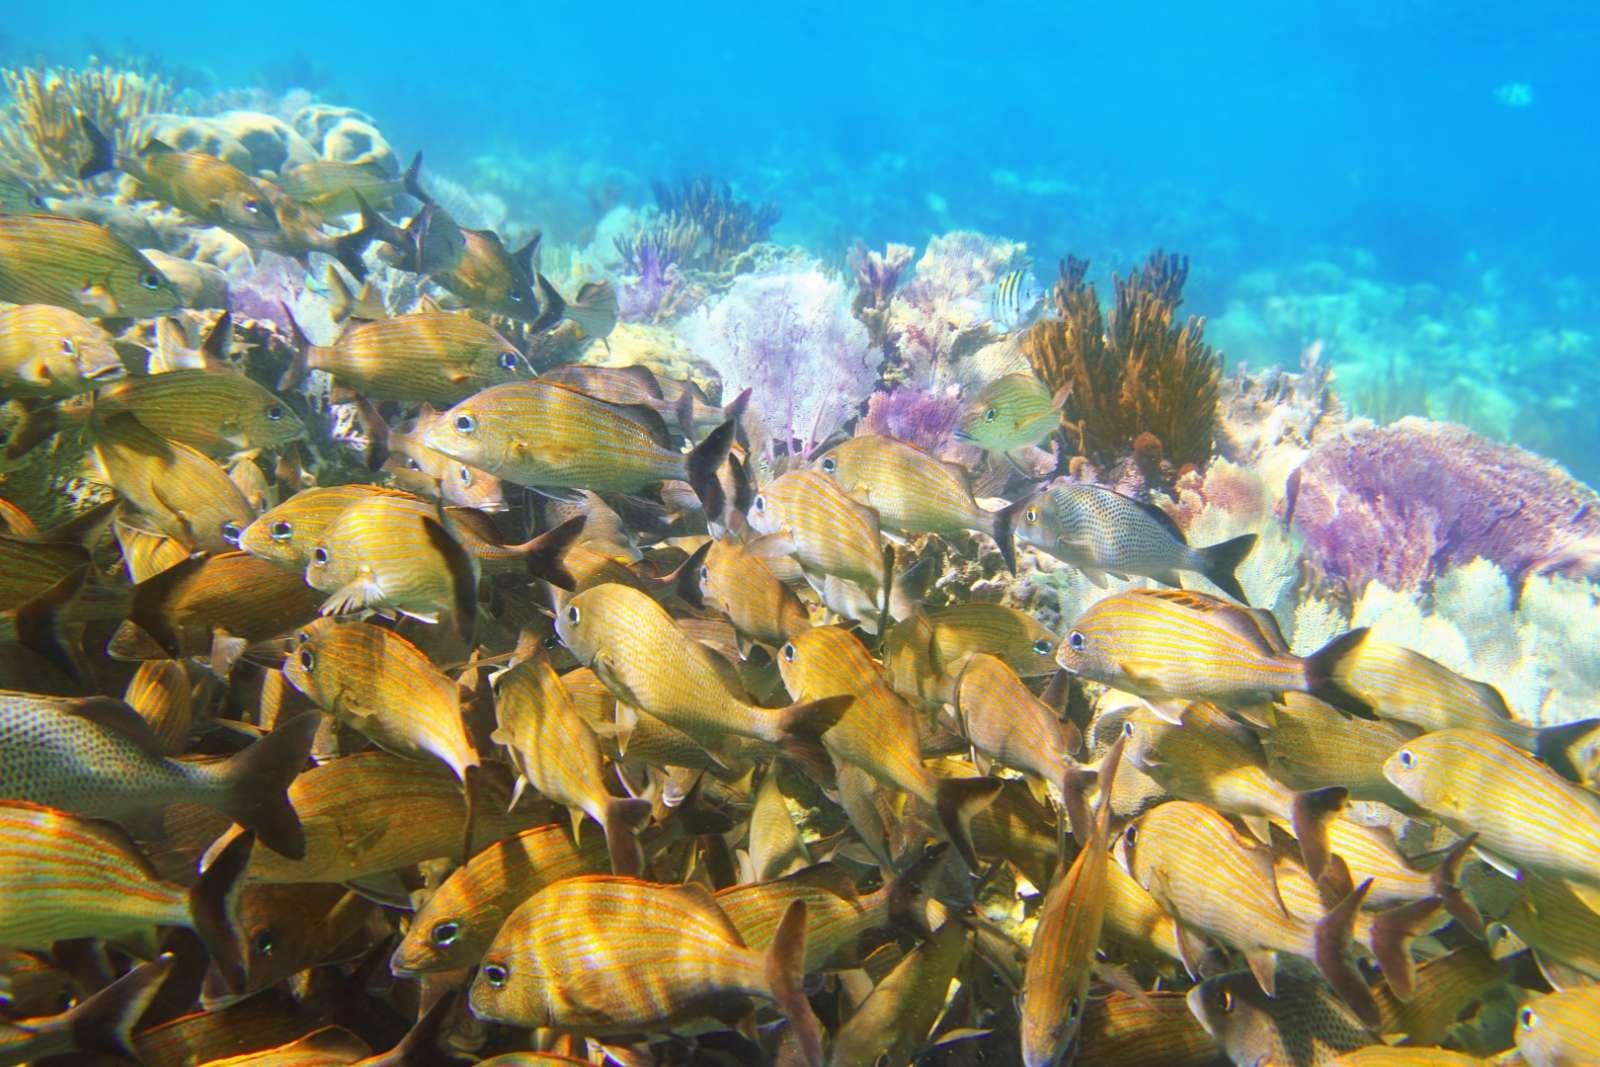 Scuba diving in the Riviera Maya Mexico